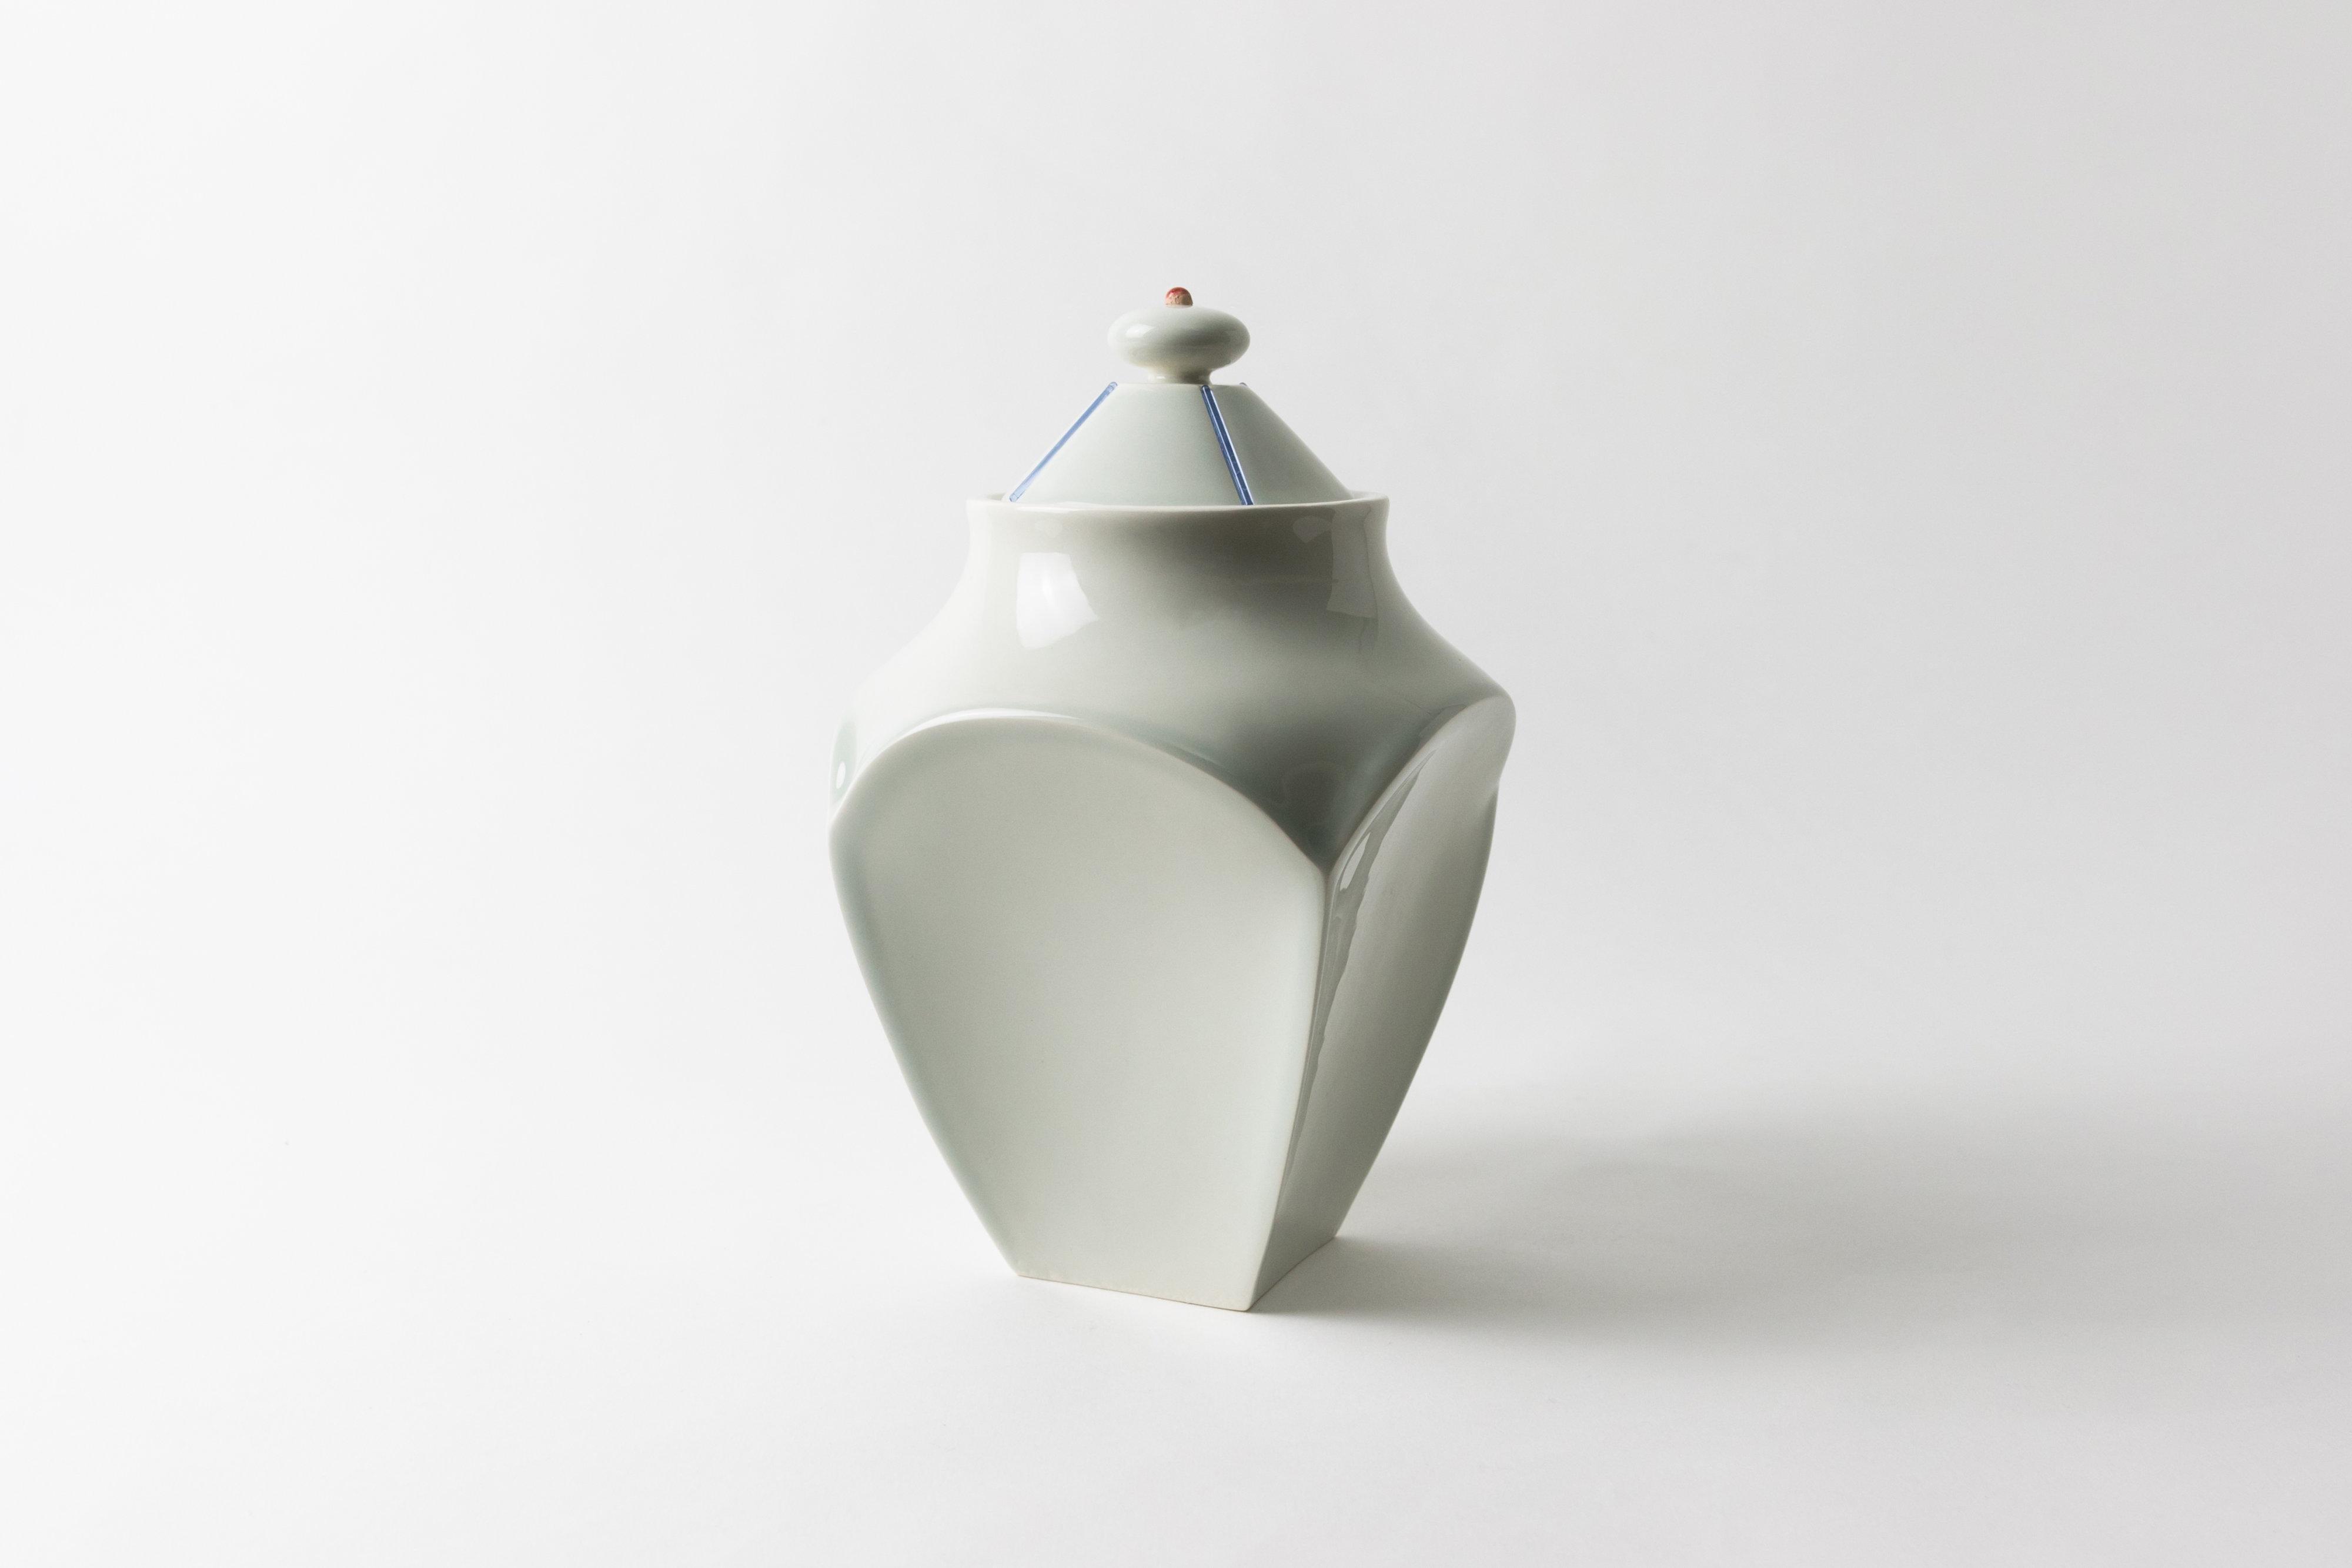 Christopher Riggio, Sweets Jar, 2020, Earthenware, Glass